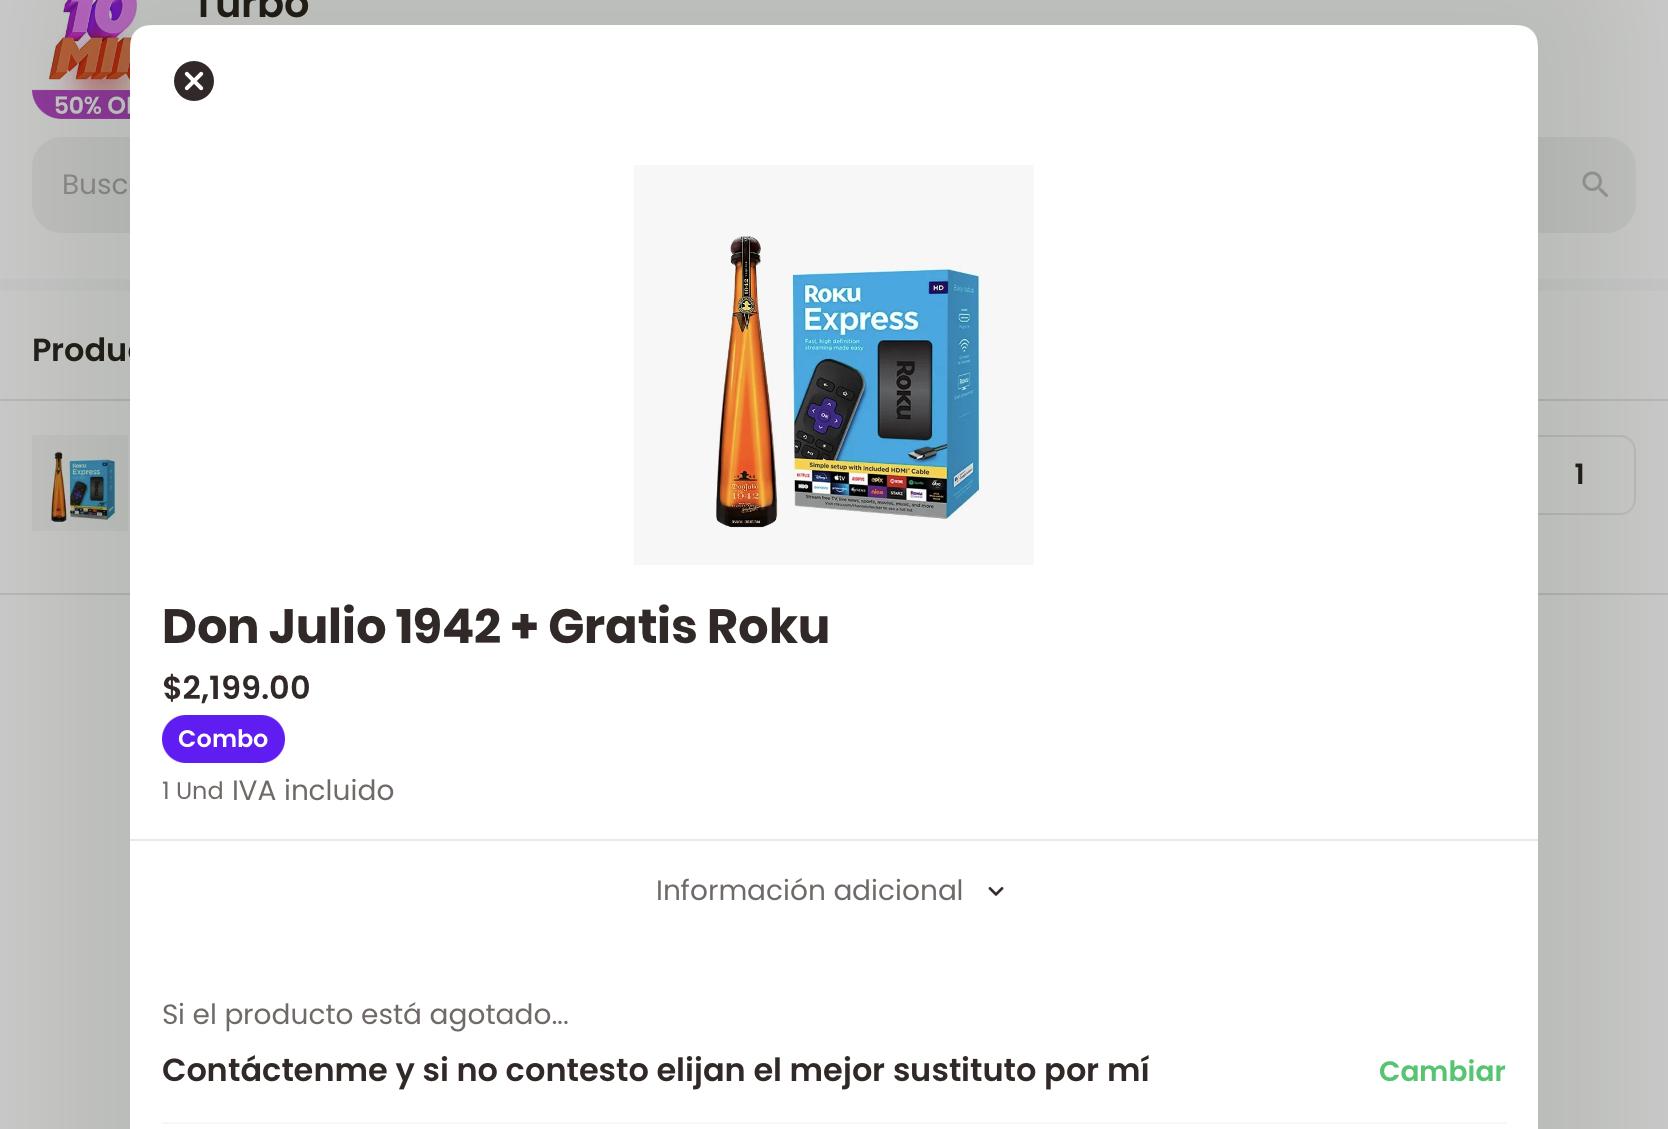 Tequila Don Julio 1942 + Roku Gratis (CDMX) RAPPI